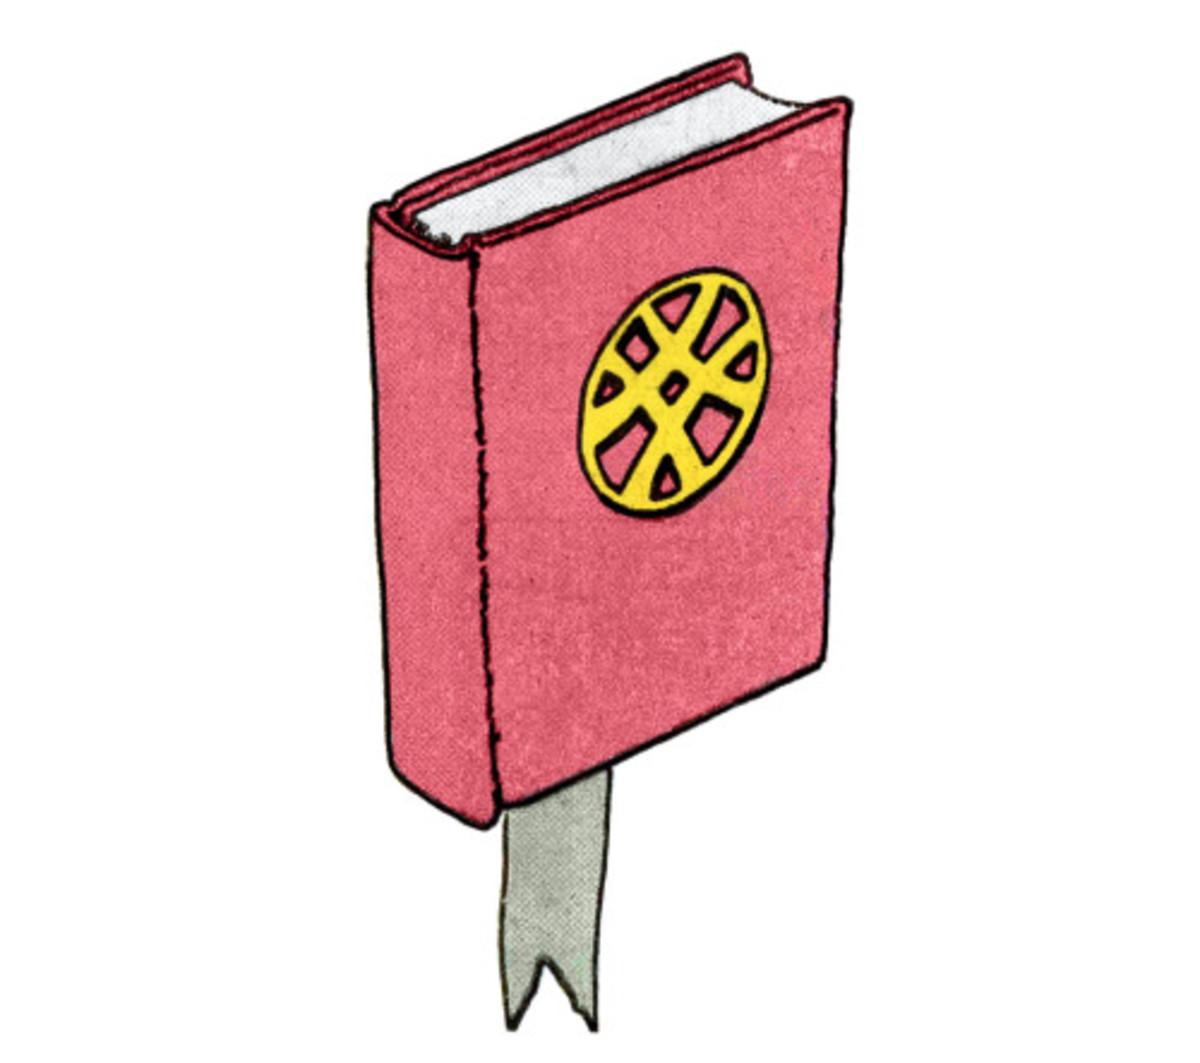 The Book of Vishanti